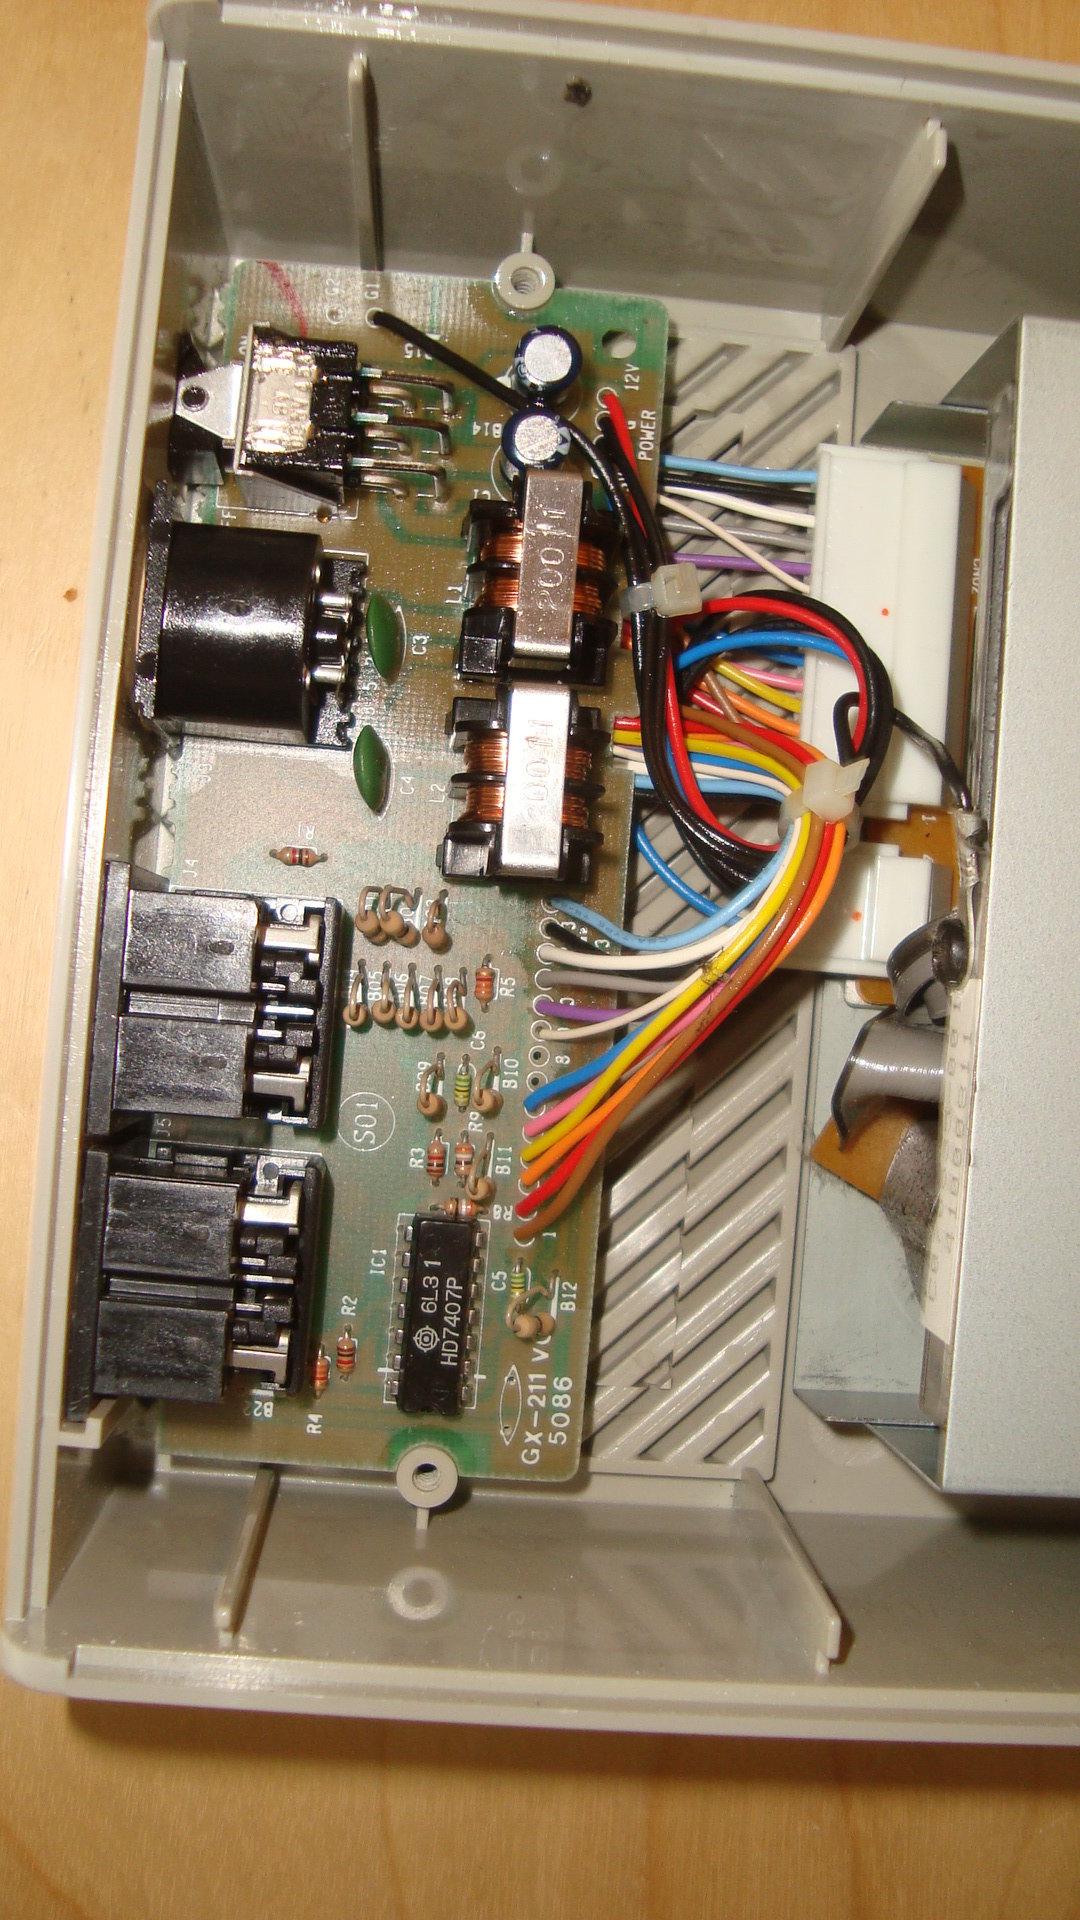 [TEST] Lecteurs disquettes externes SF354/SF314 - Atari ST 201015110450145389